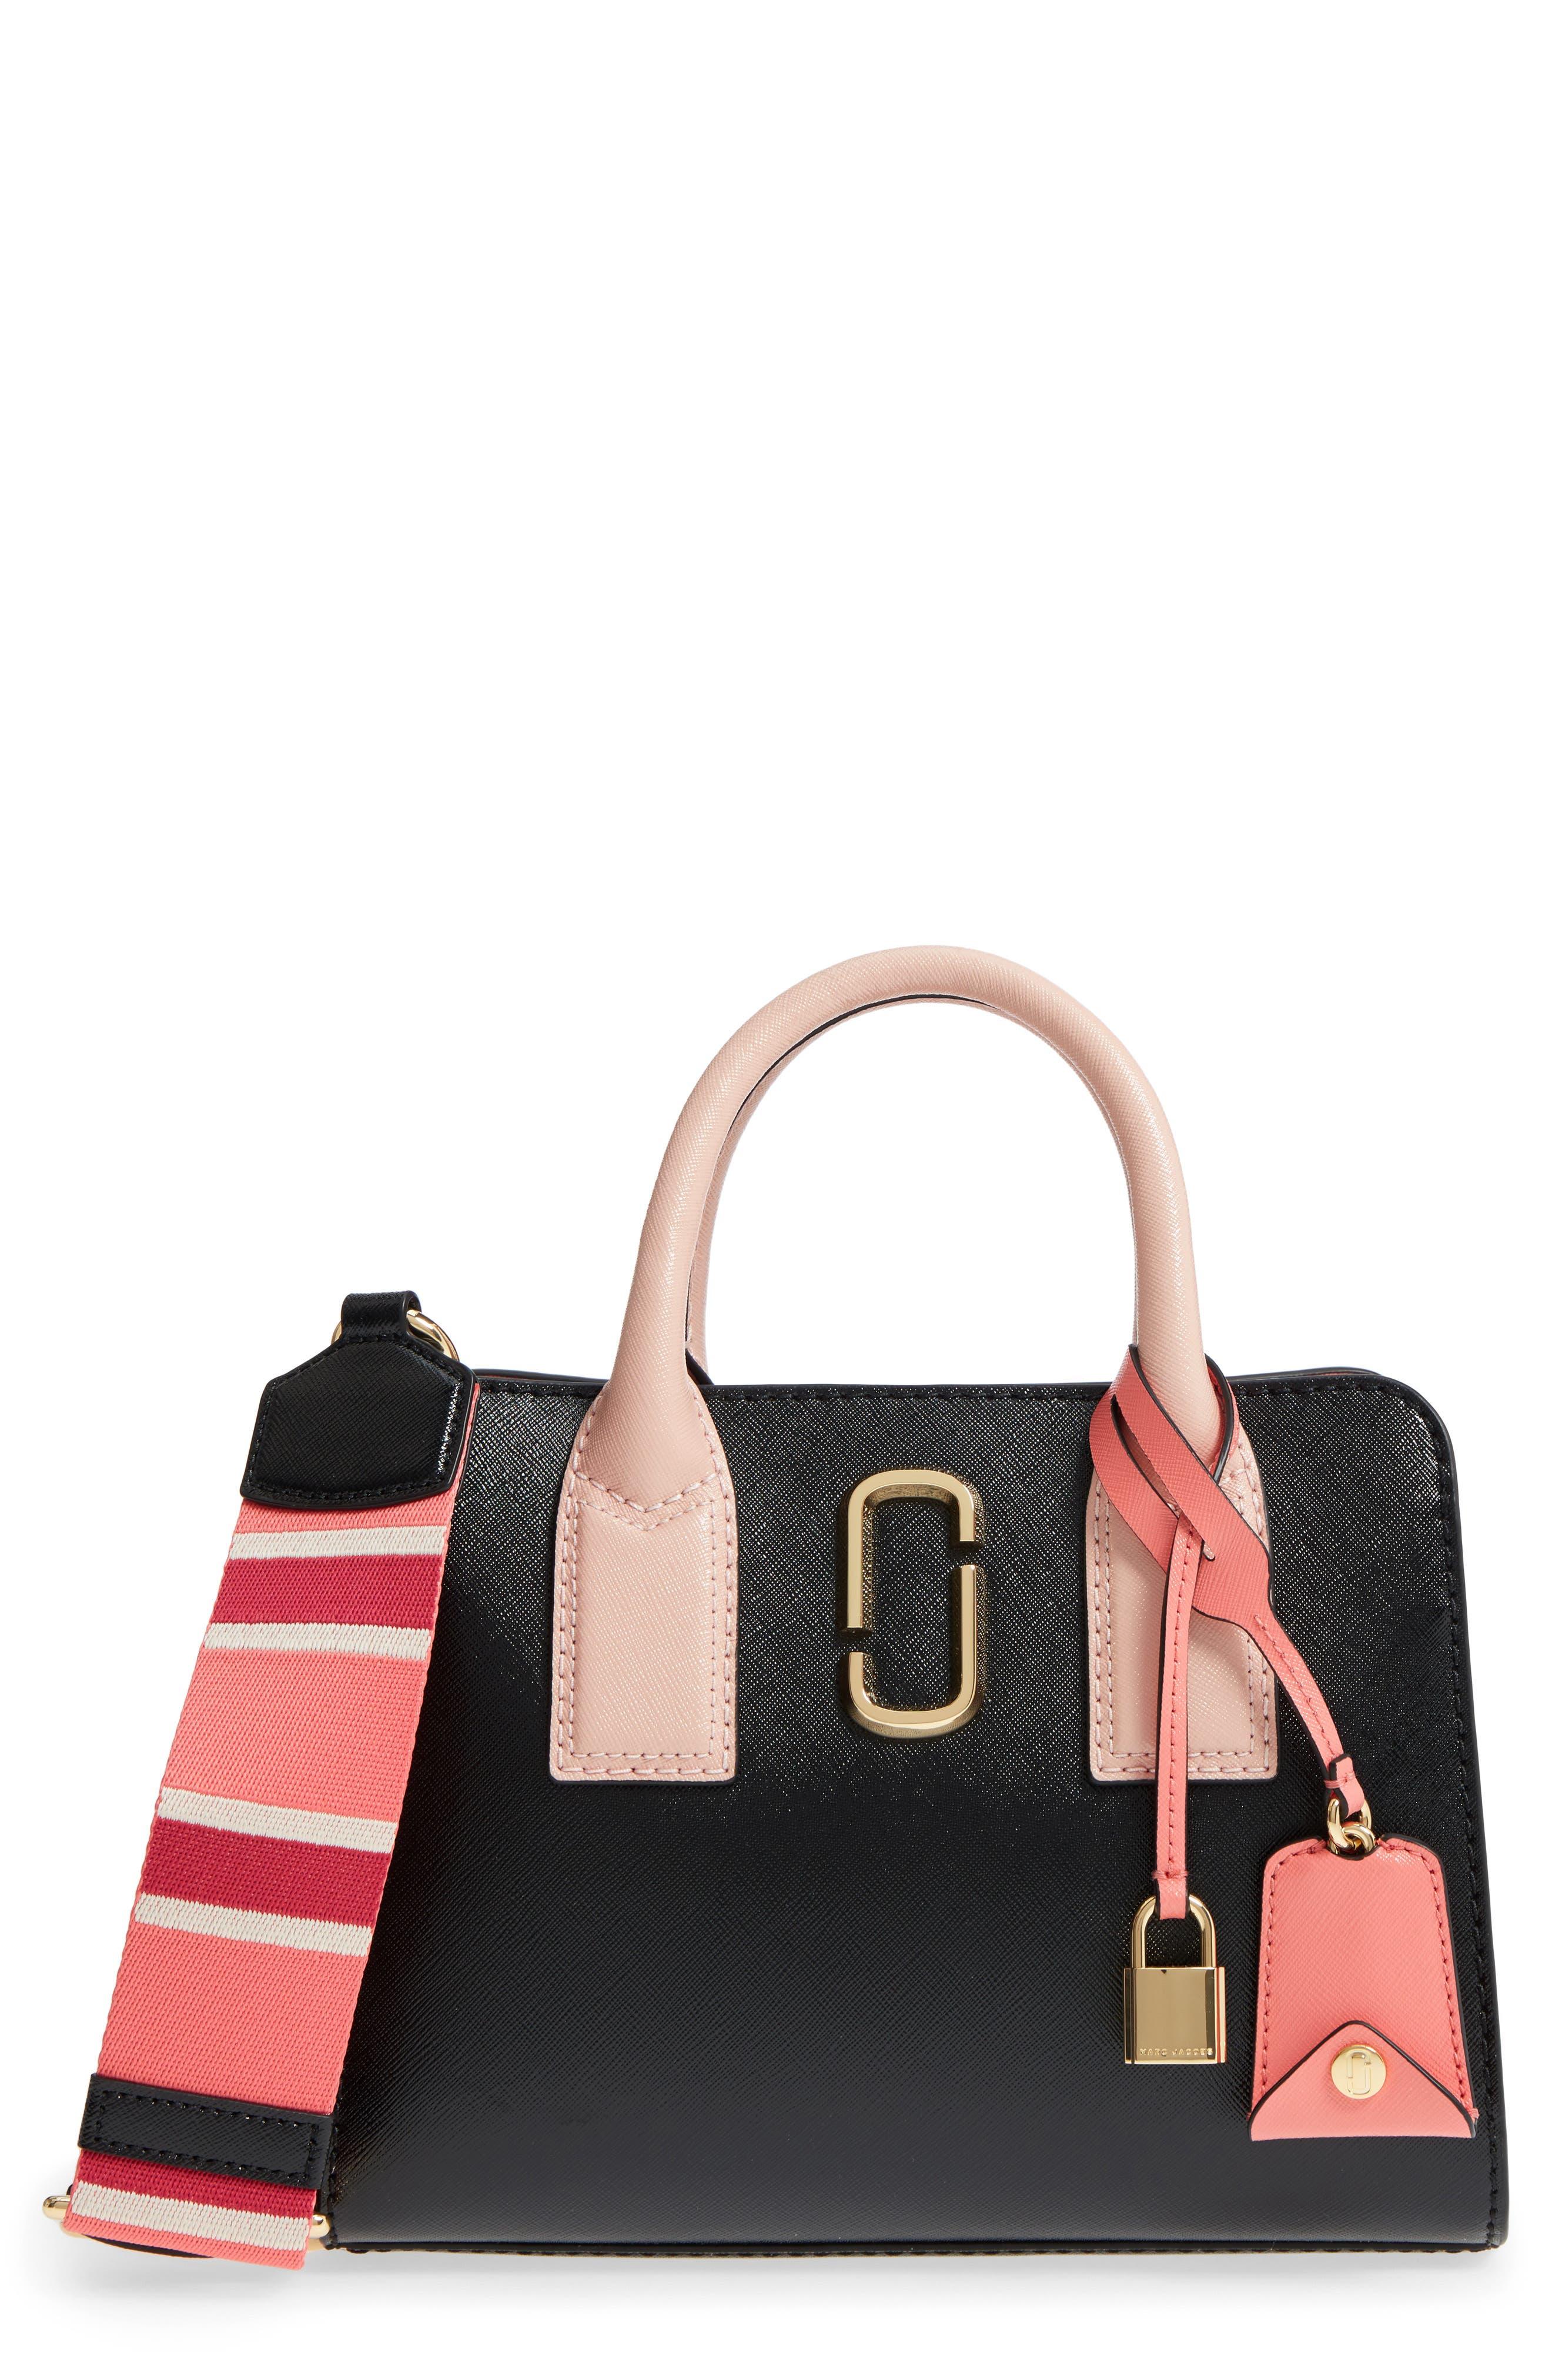 Big Shot Color Block Saffiano Leather Satchel in Black/Gazelle